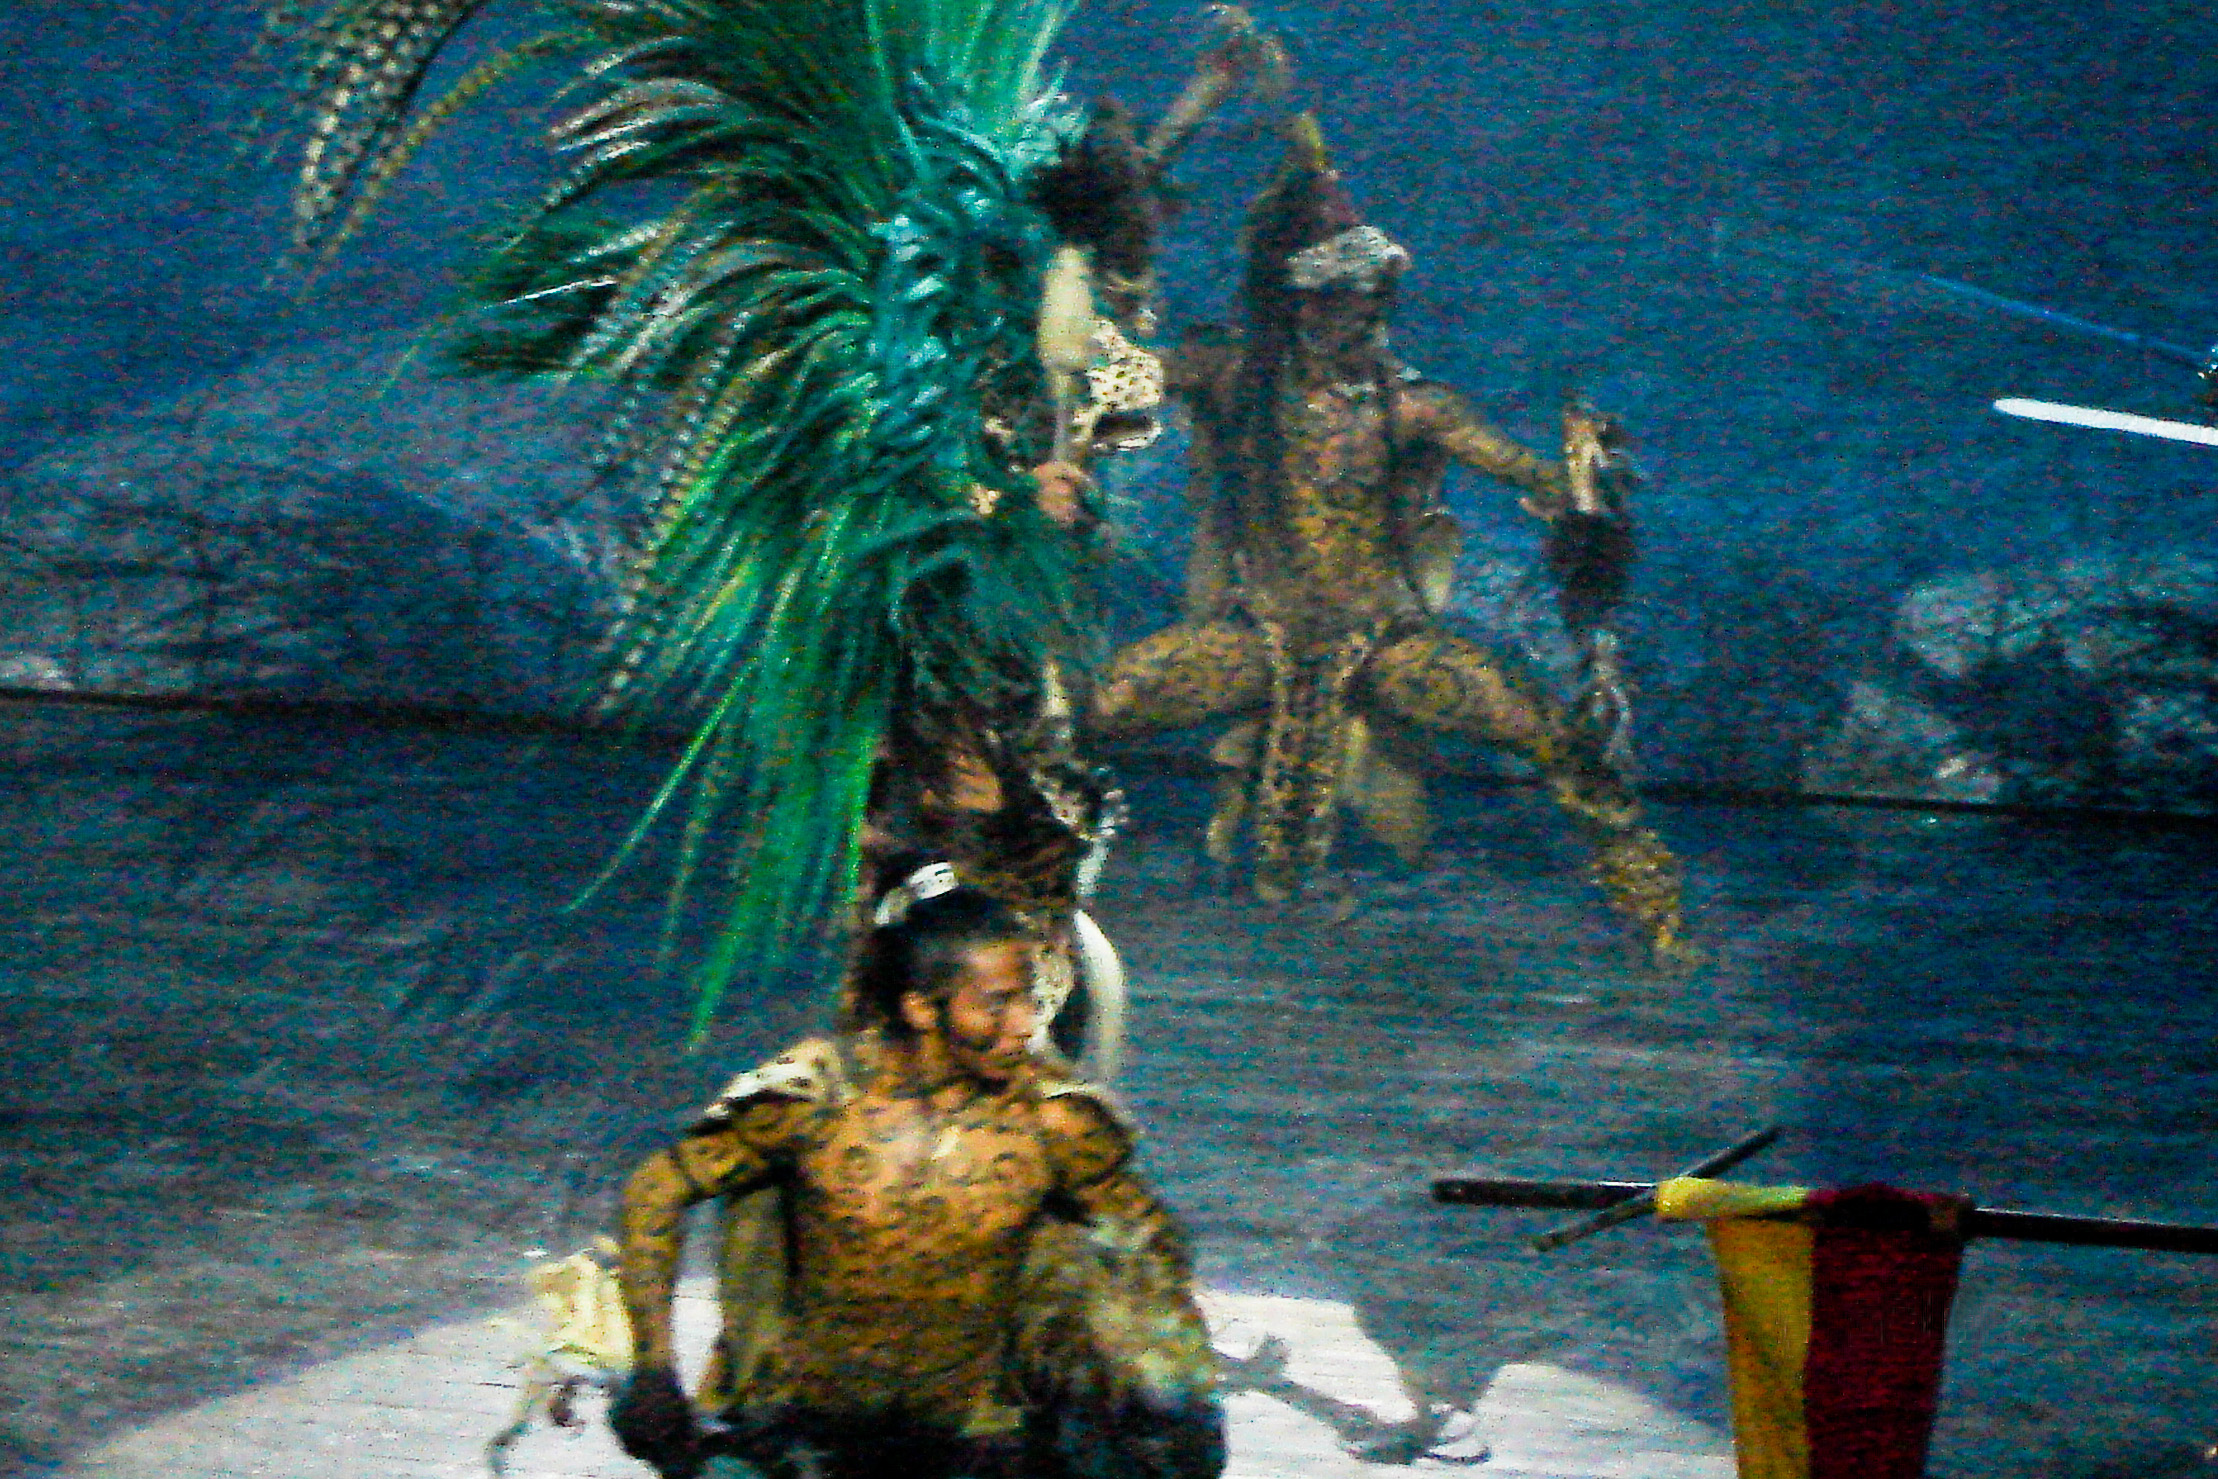 Aztec Jaguar Warrior by sebastian17th on DeviantArt